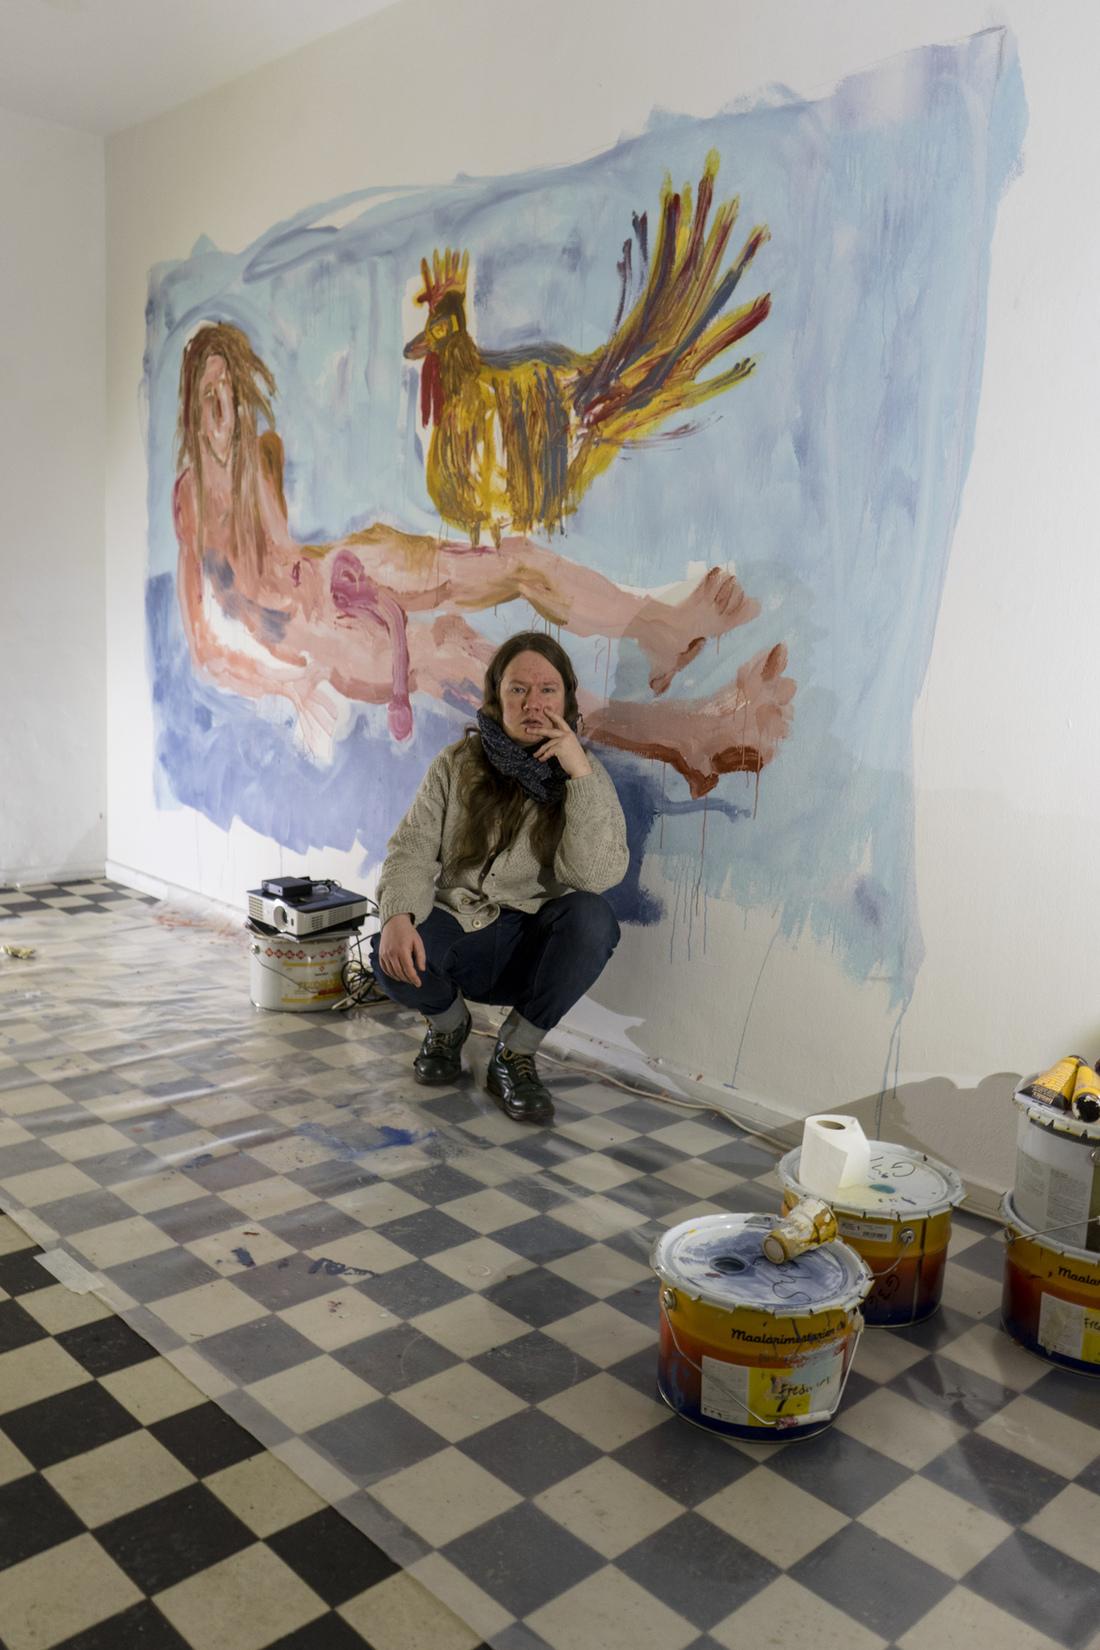 Joonas Jokiranta - Selfportrait w a large cock